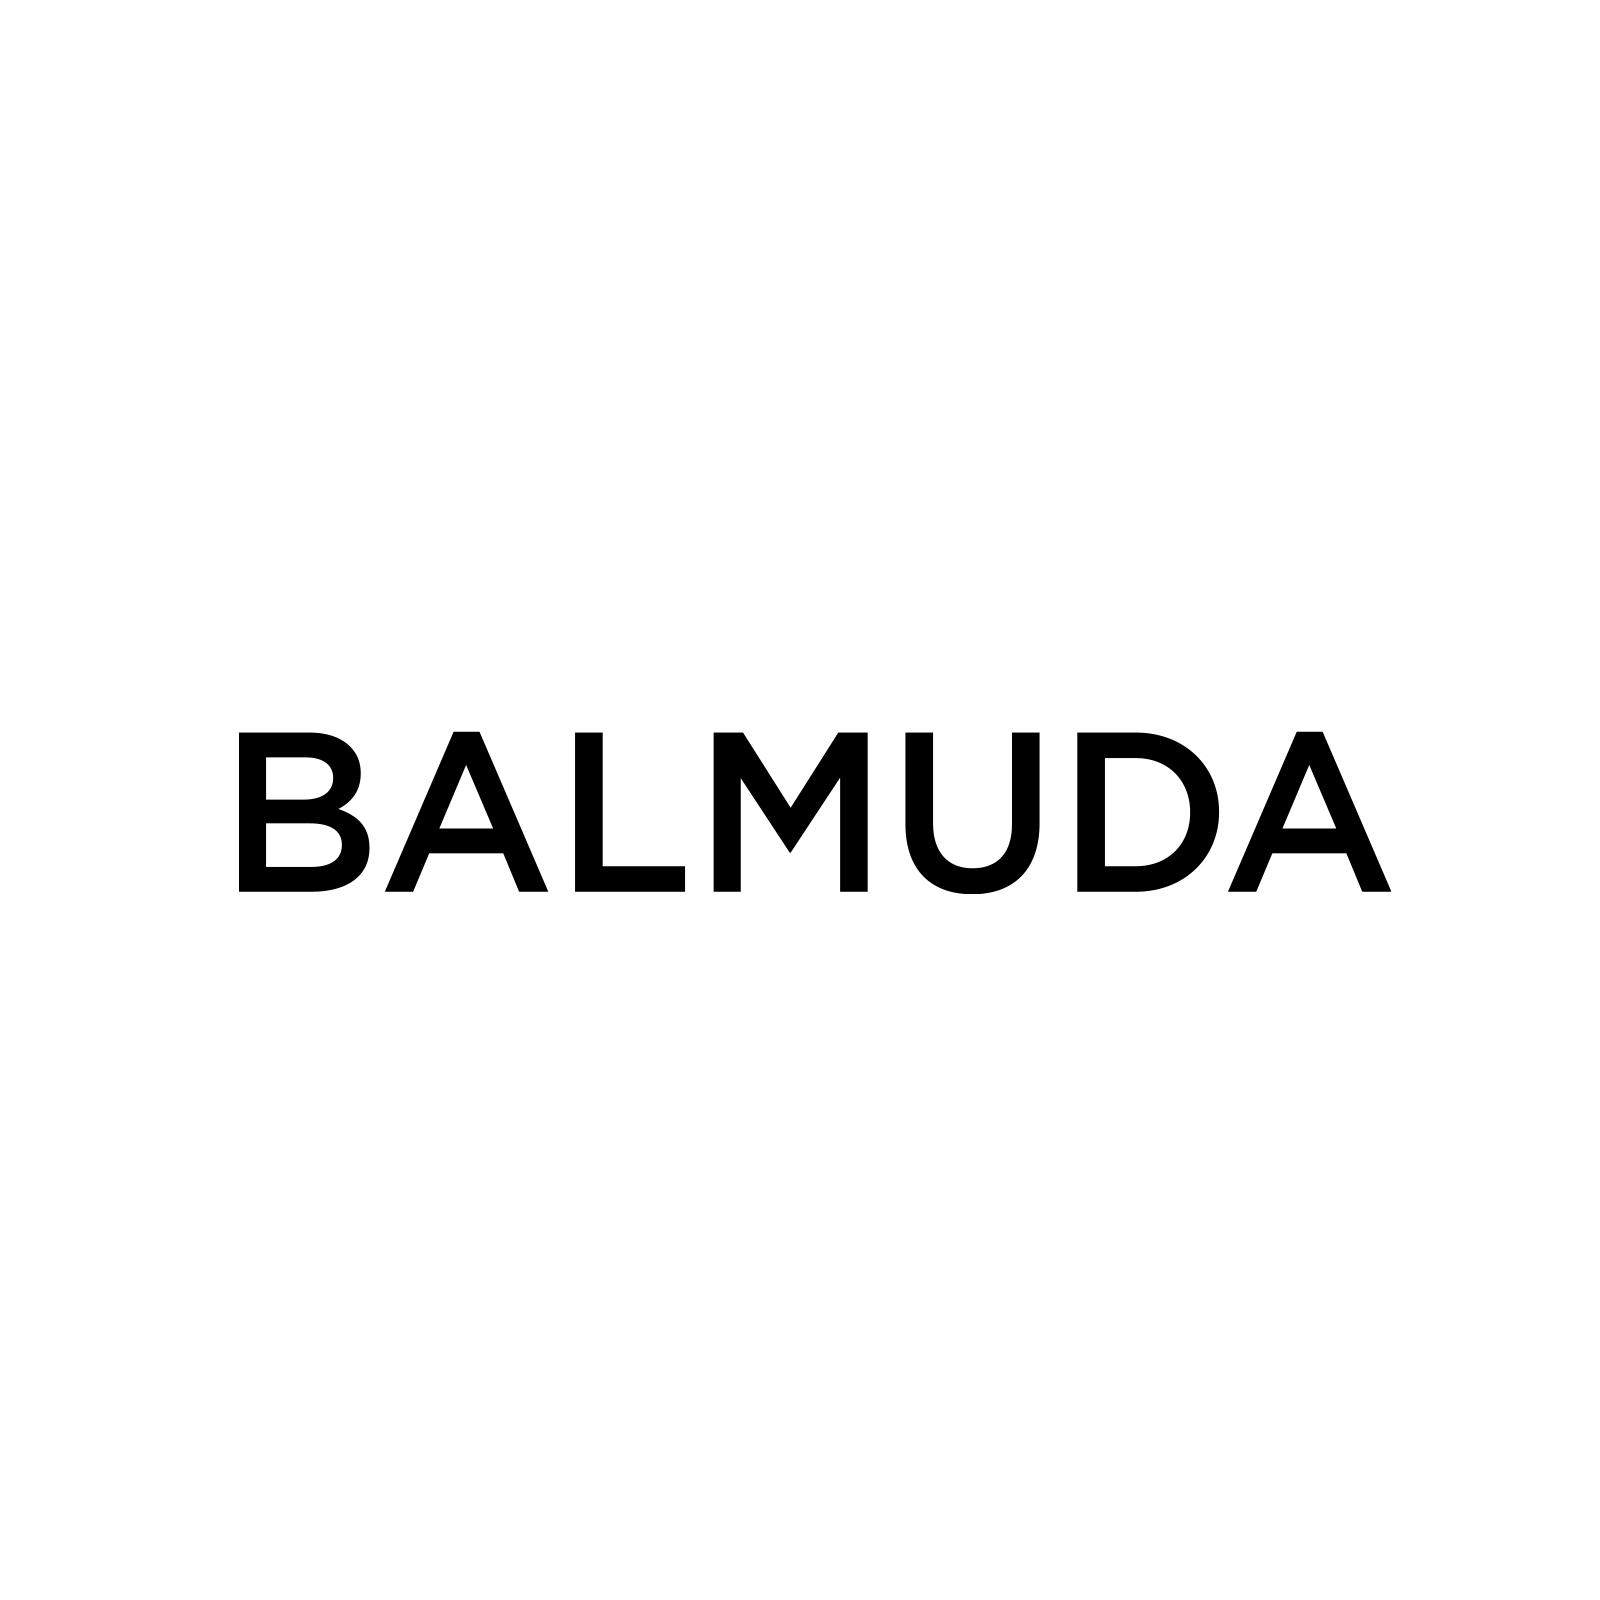 BALMUDA Inc.